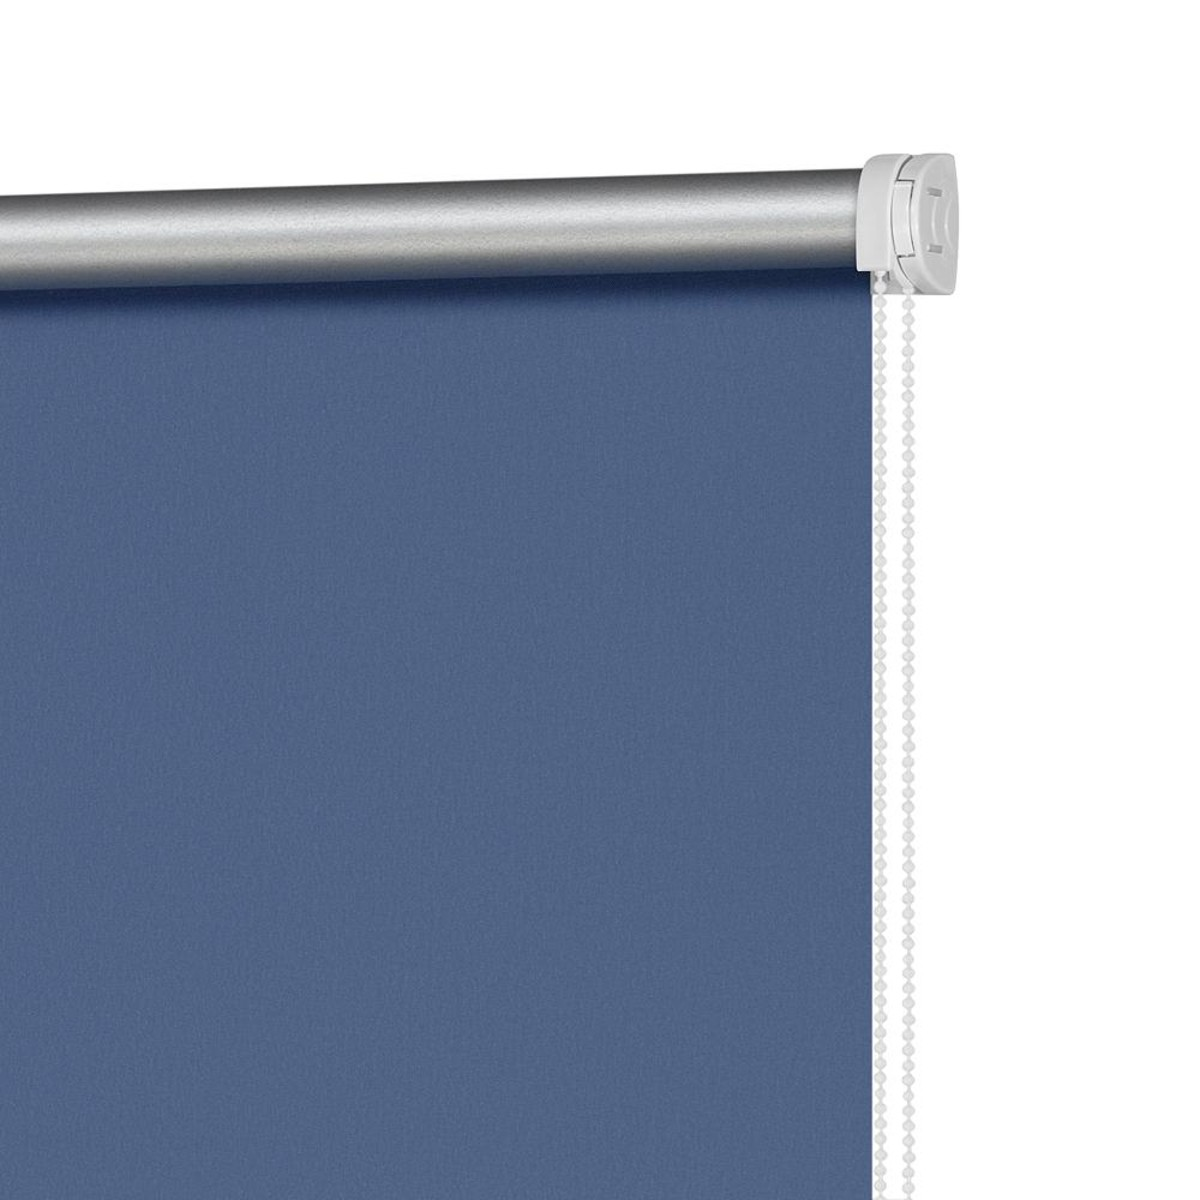 Рулонная Ора Decofest Блэкаут Плайн 60Х160 Цвет Синий